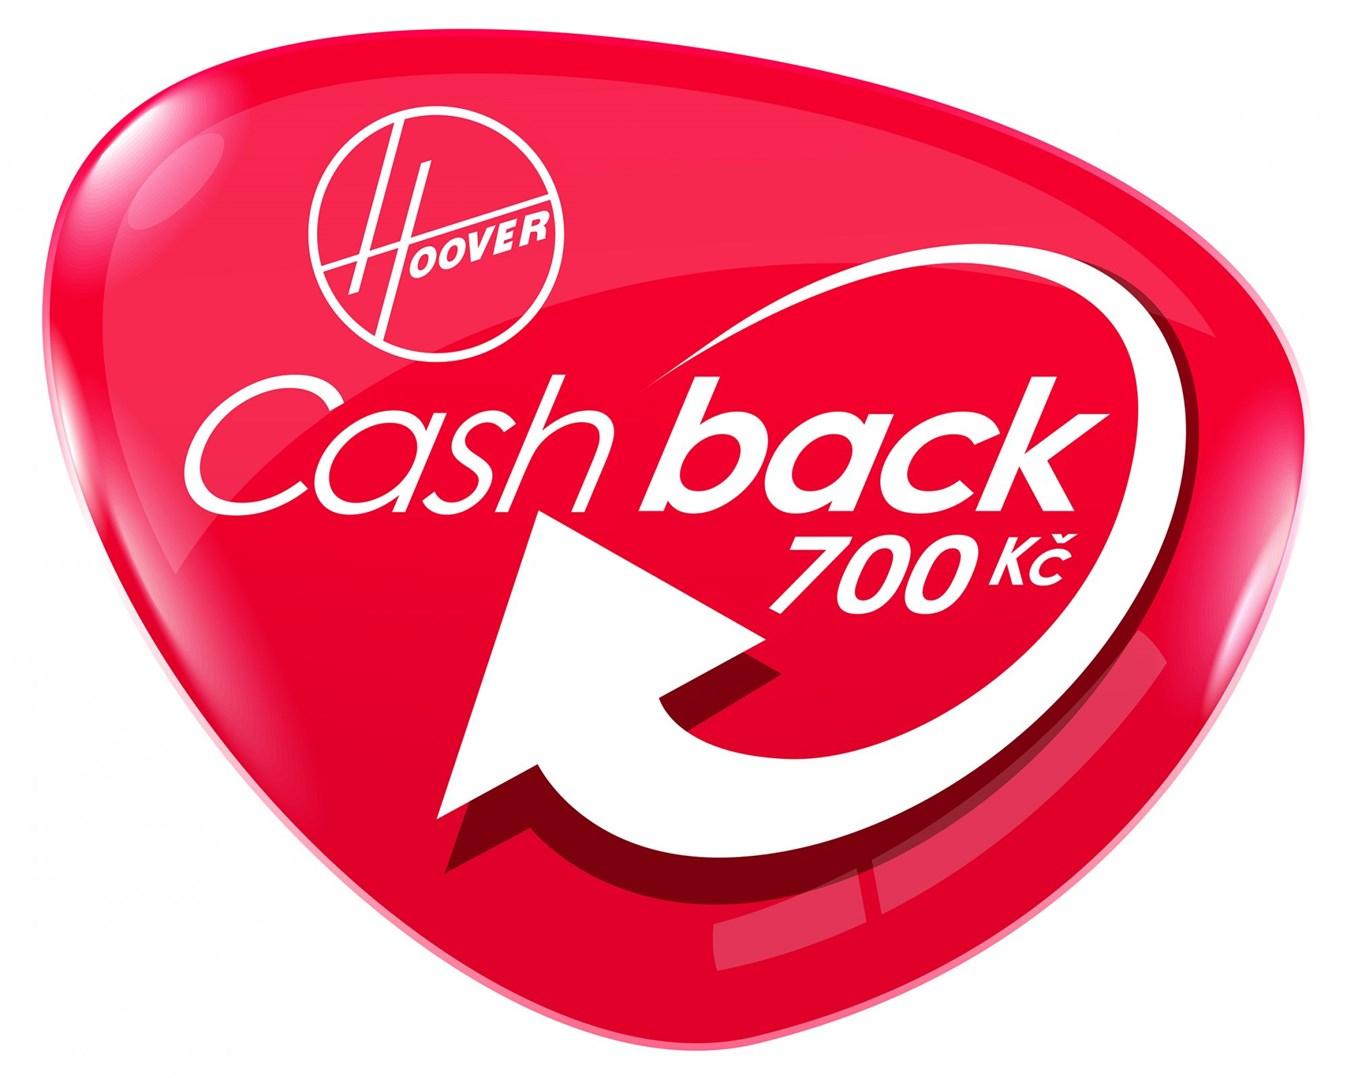 HOOVER CashBack 700 Kč